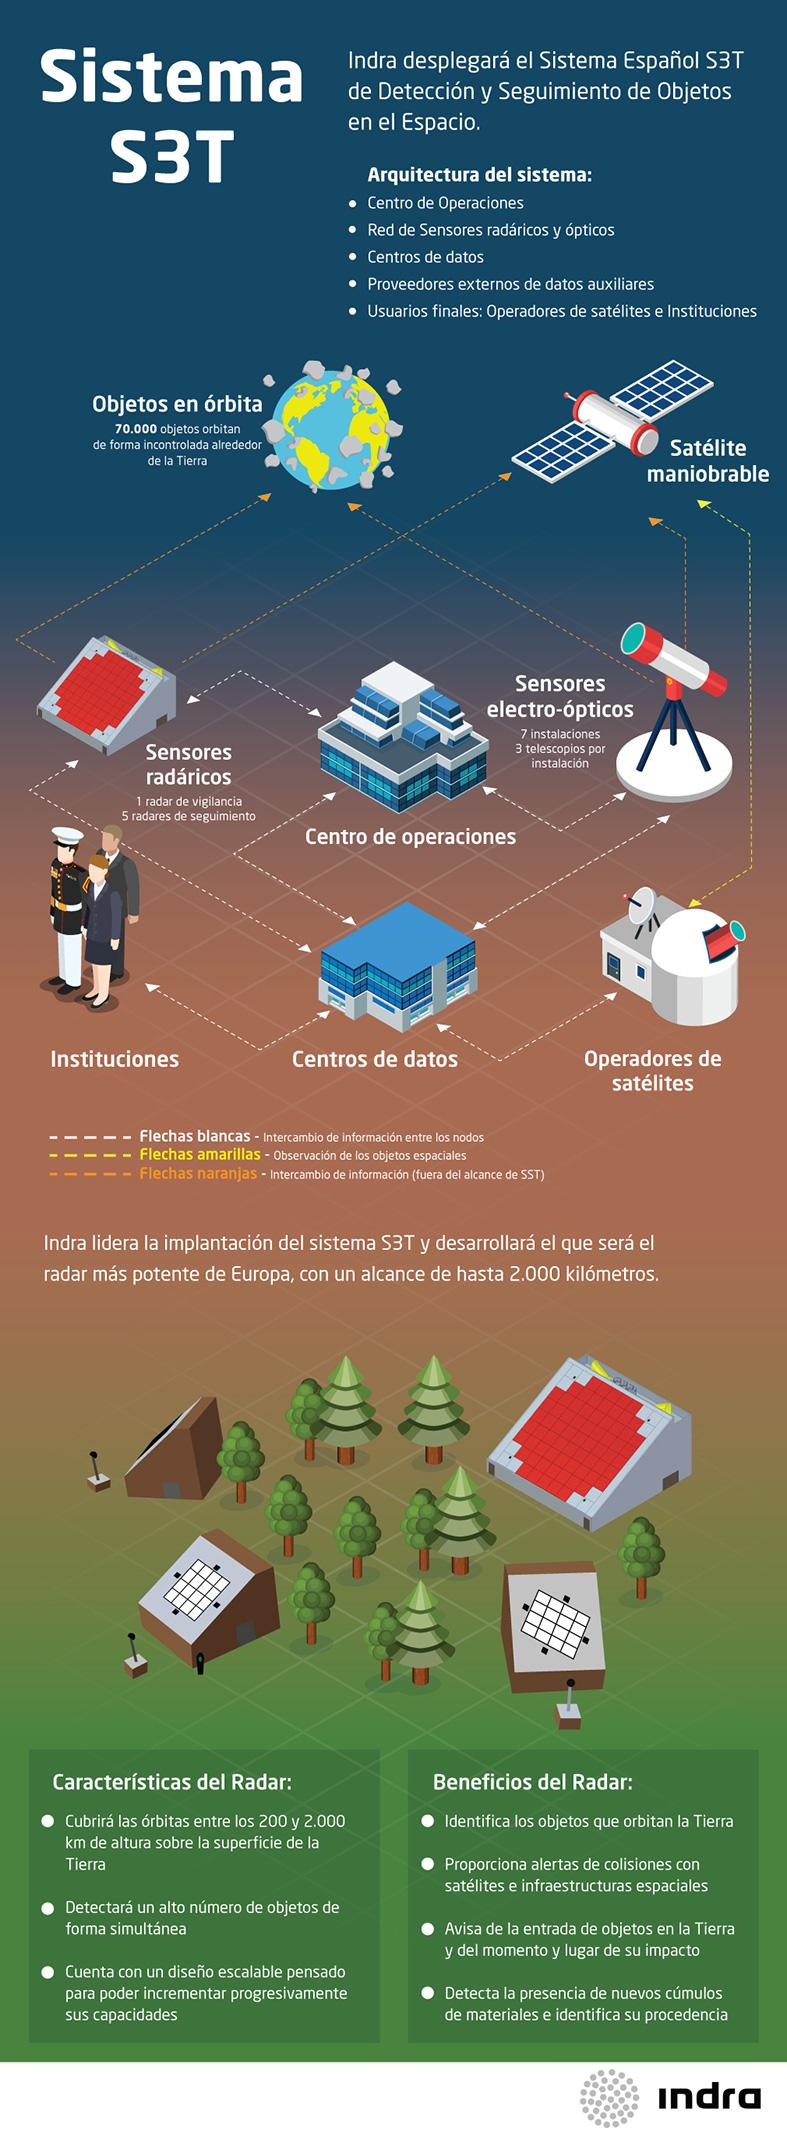 infografia-indra-sistema-vigilancia-espacio-s3t